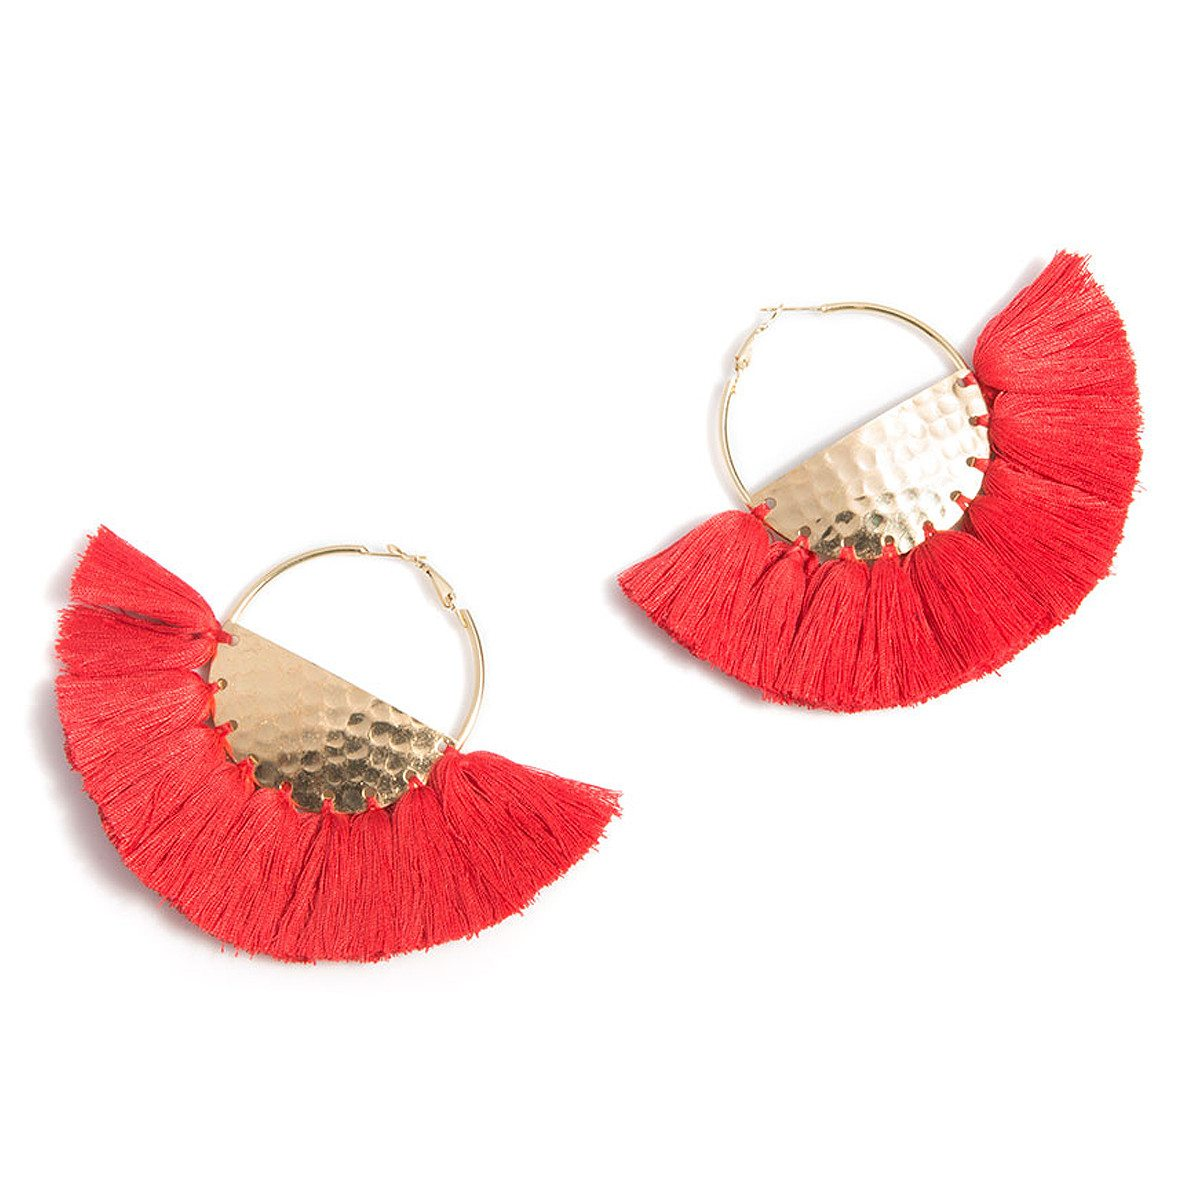 anyay-earrings-red-shopceladon